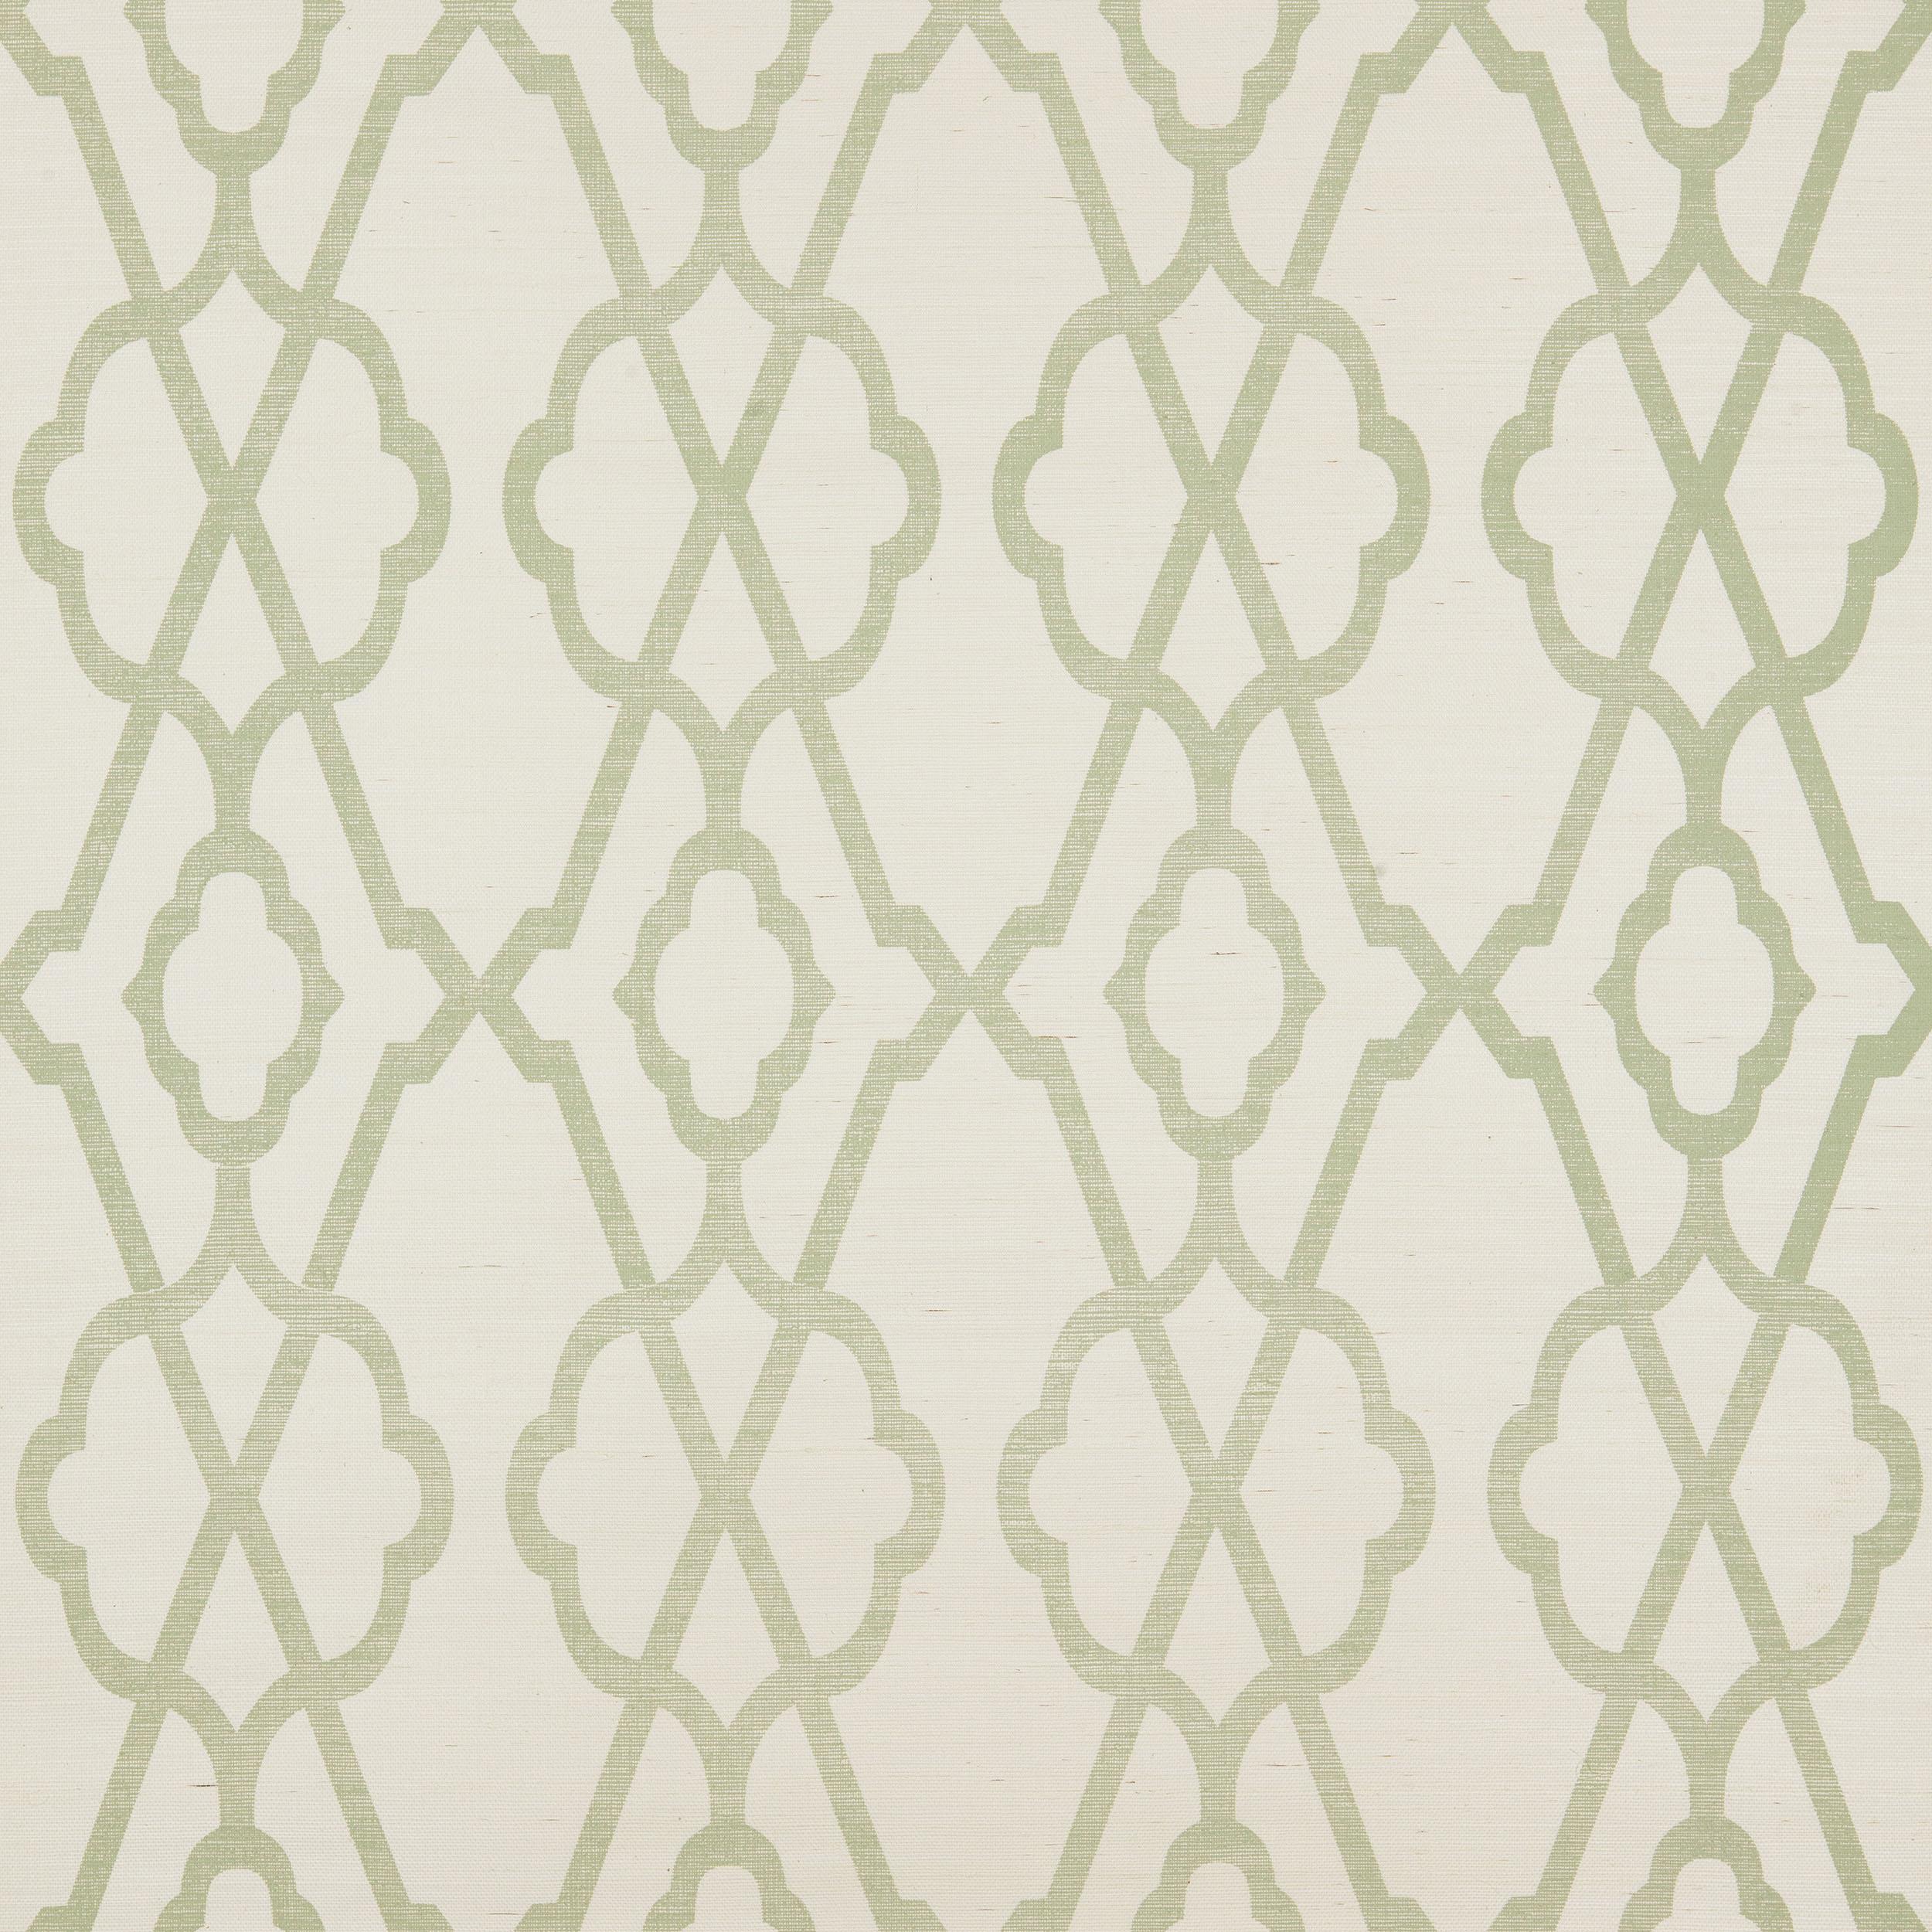 hayworth trellis wallpaper - Trellis Wall Paper